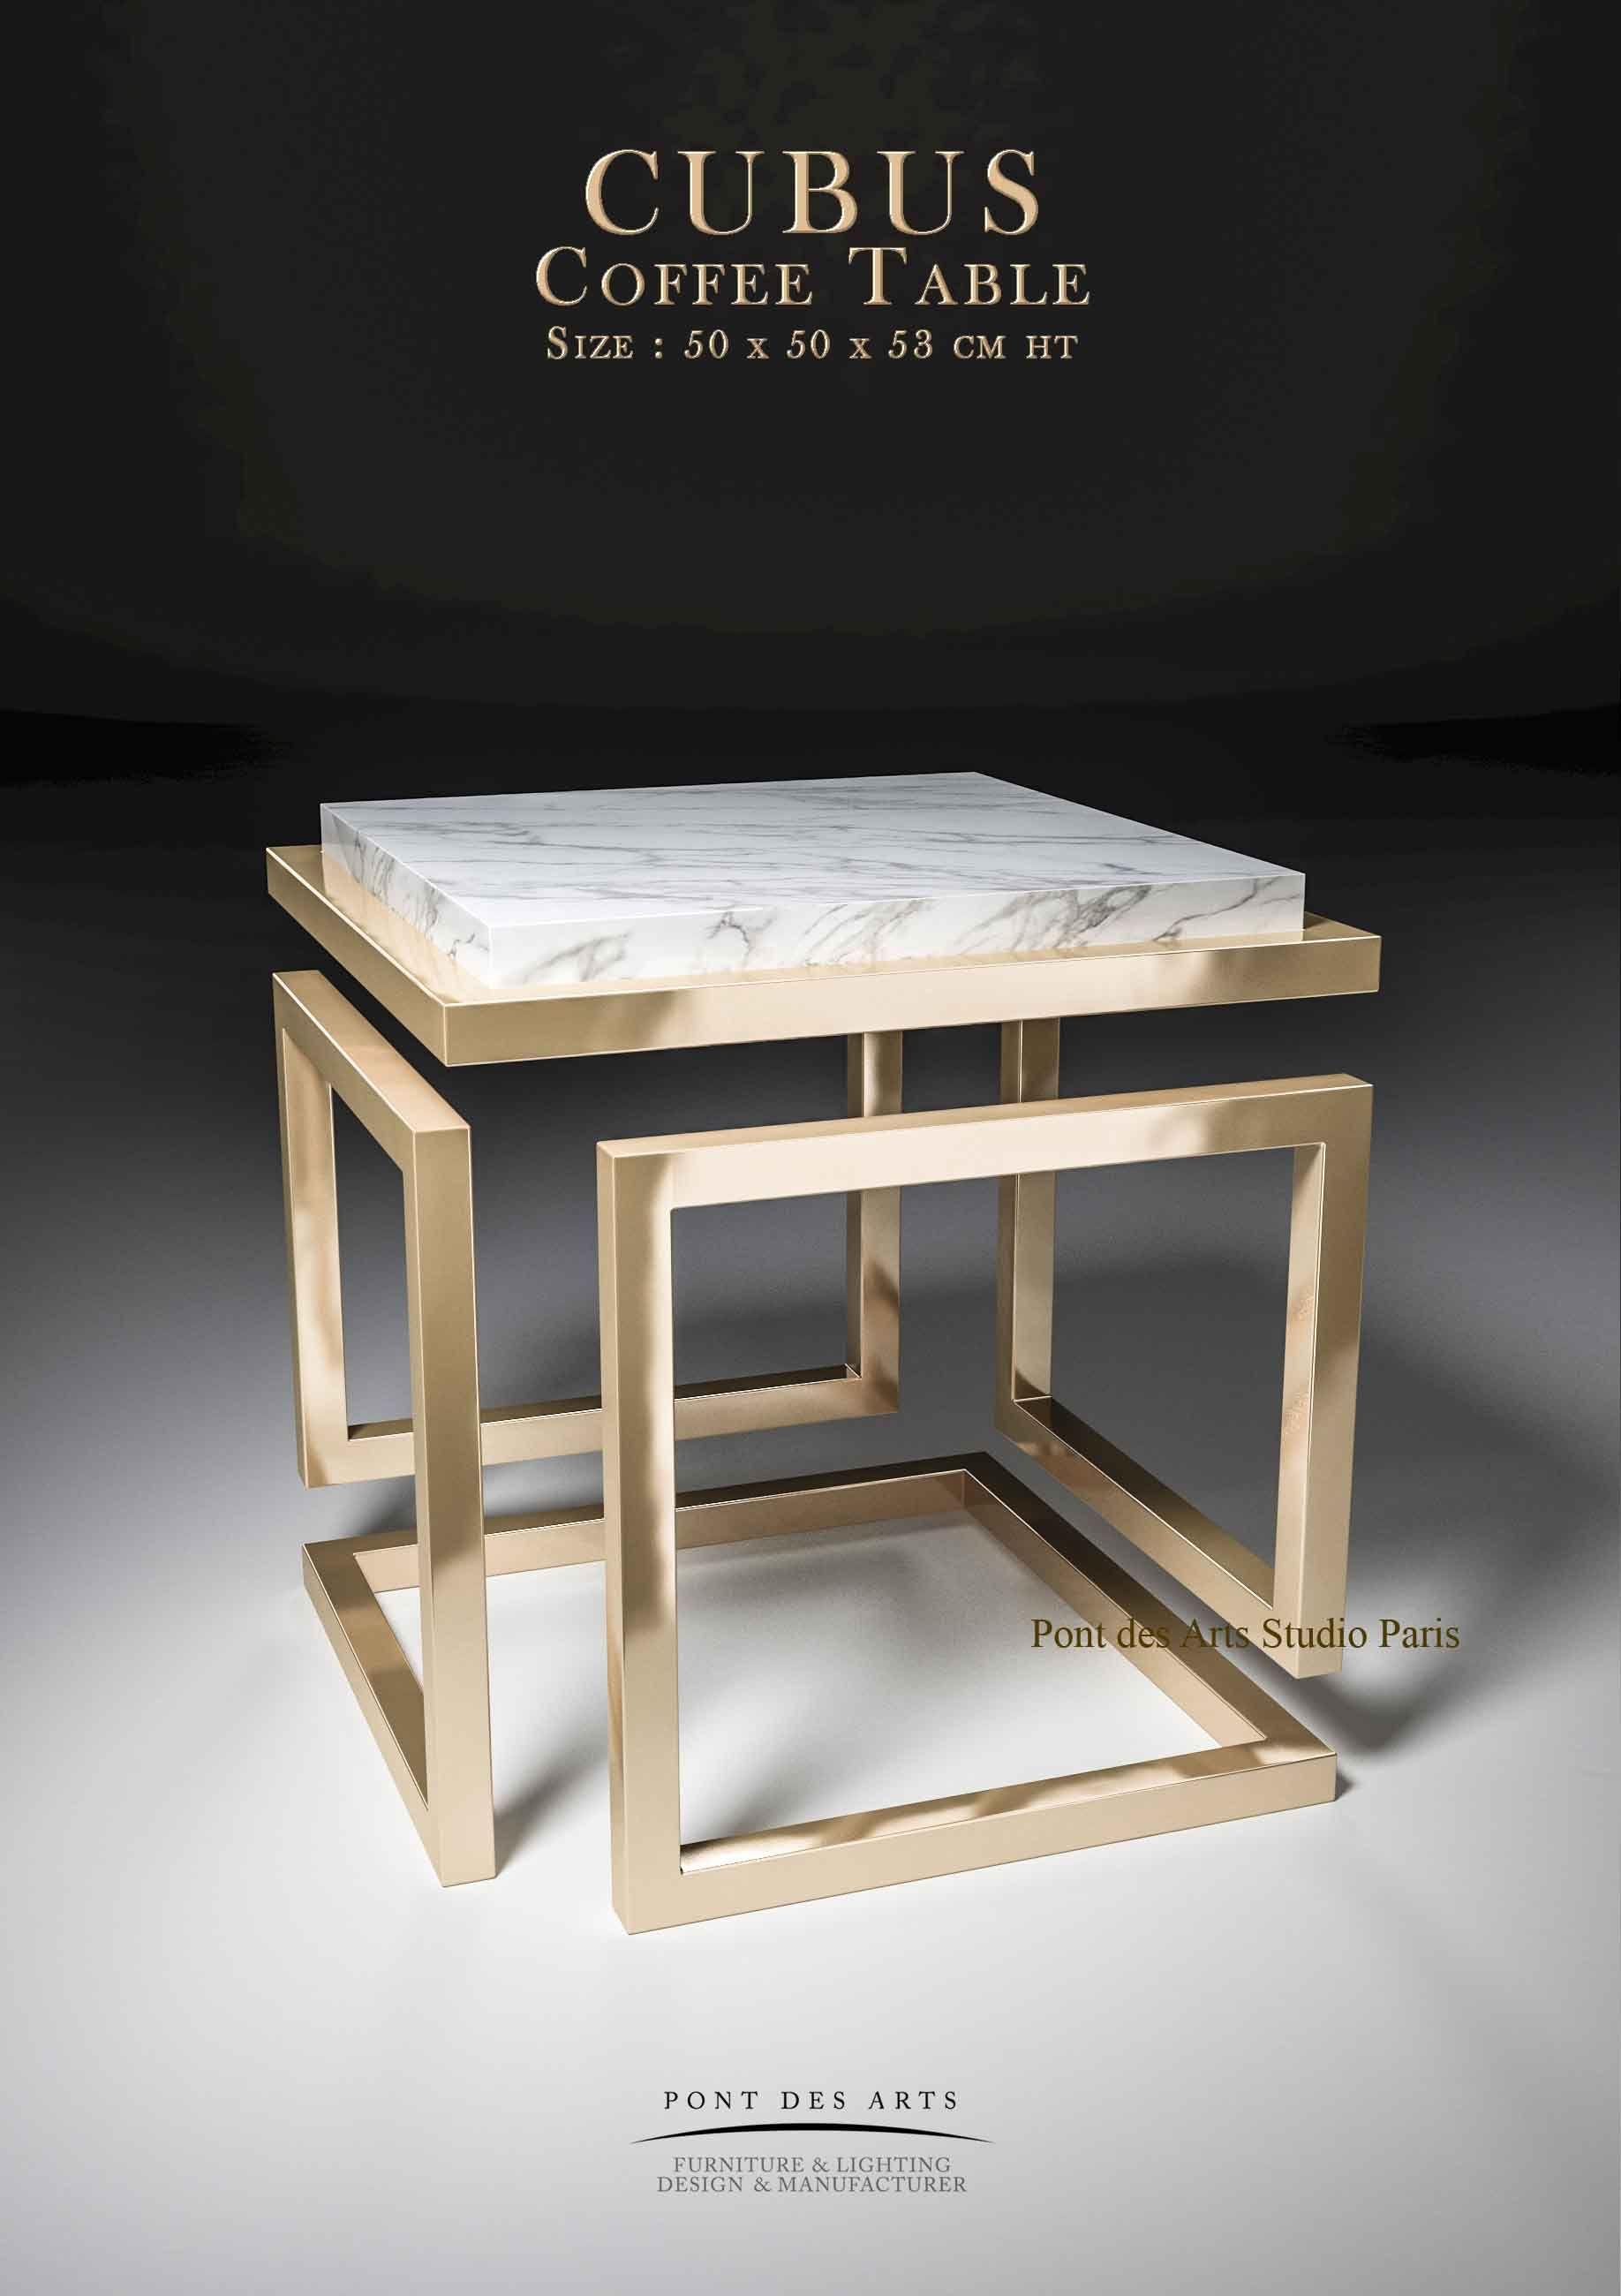 Sculptural Coffee Table Designer Monzer Hammoud Pont Des Arts Studio Paris Table Hotel Yacht Coffeetabl